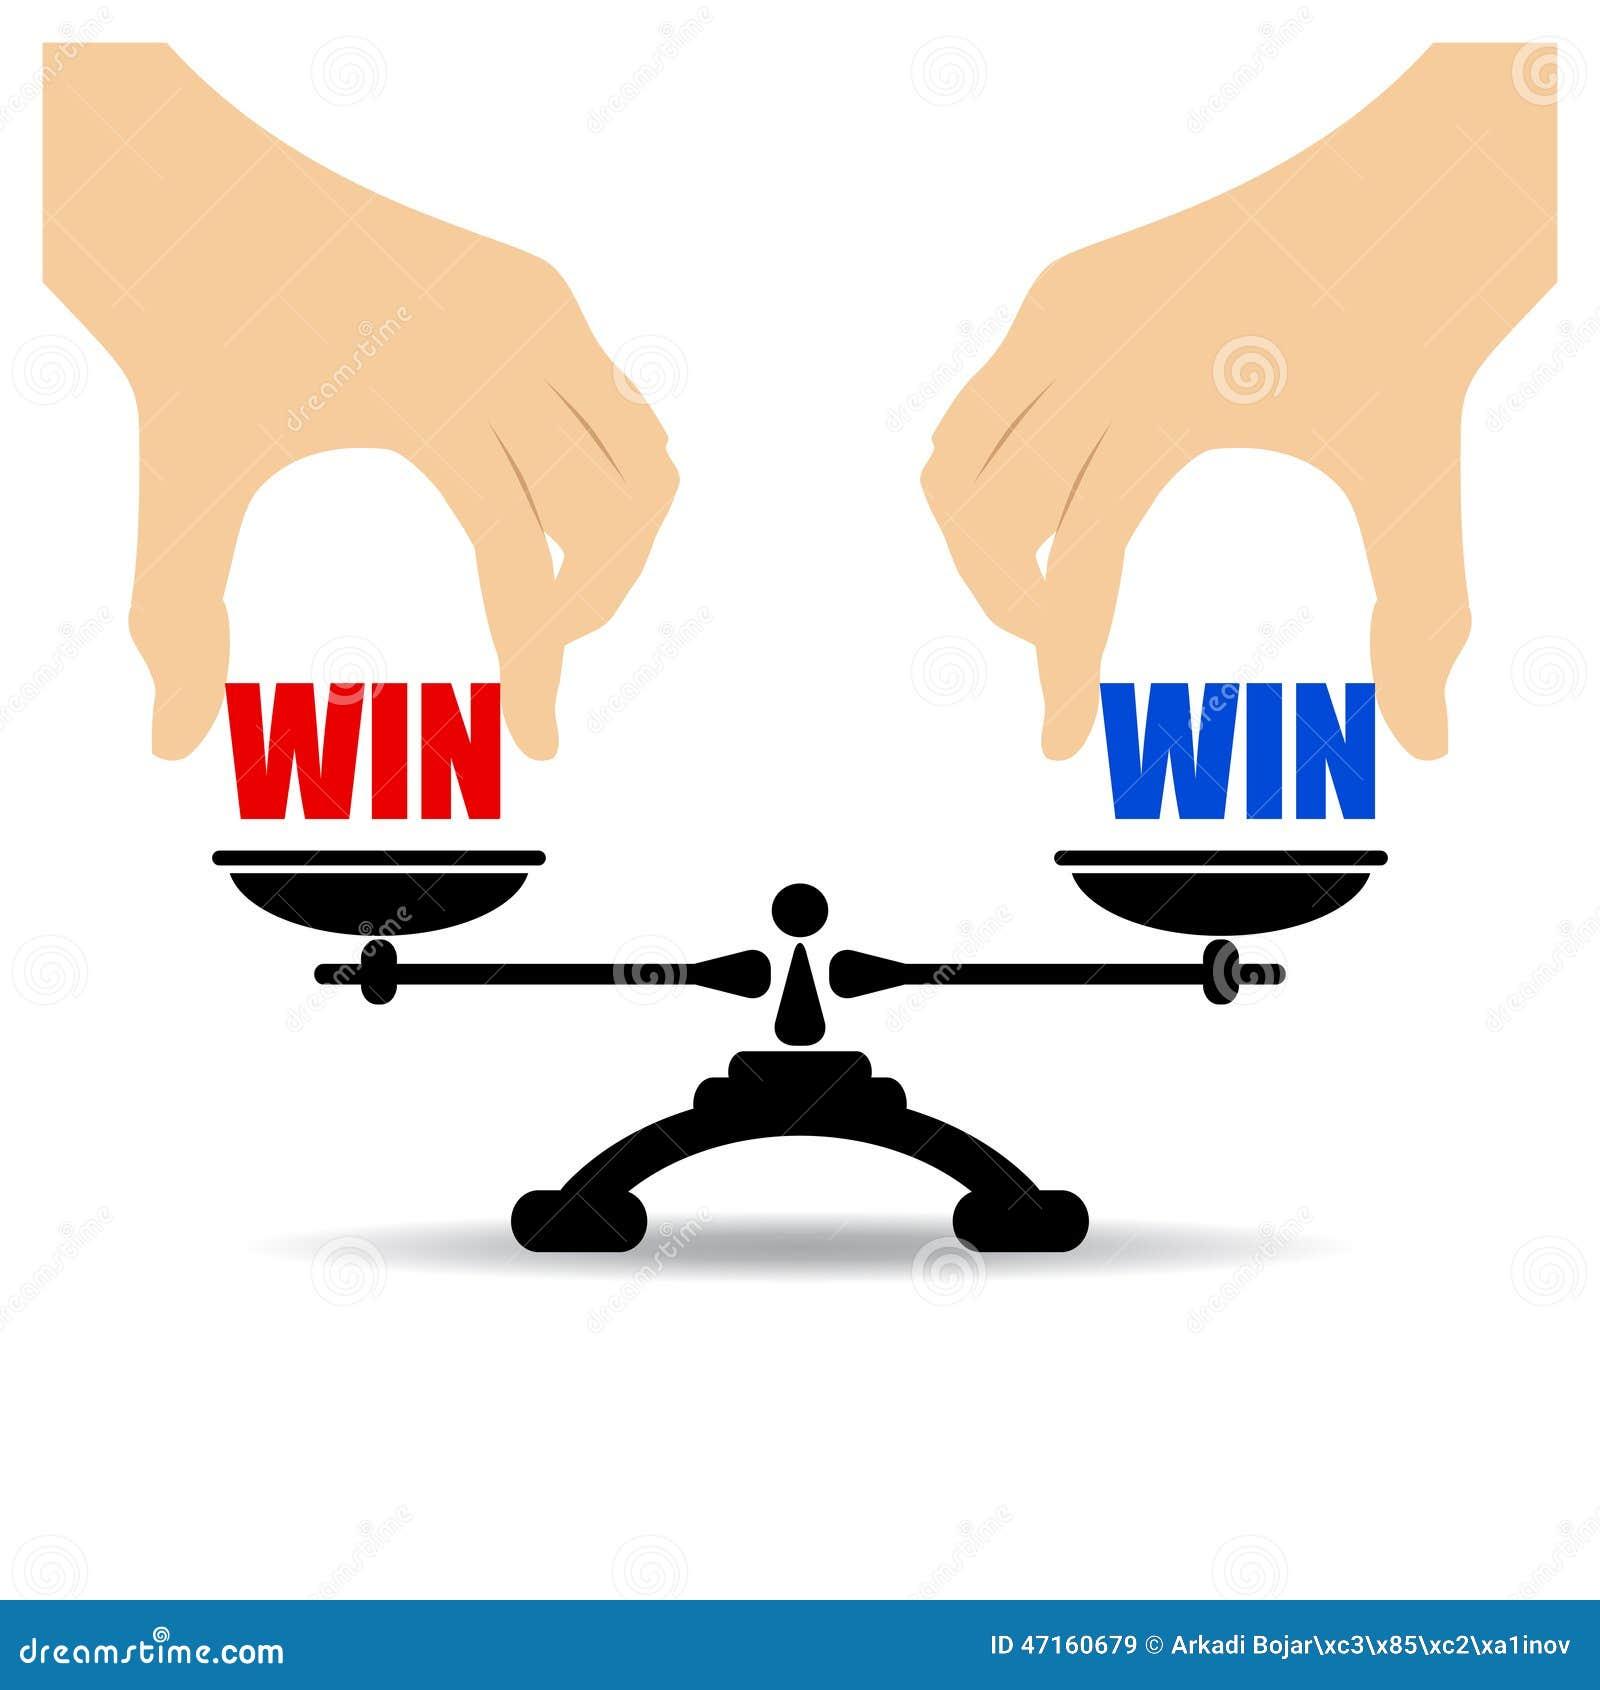 Win Win Concept Stock Vector Image 47160679